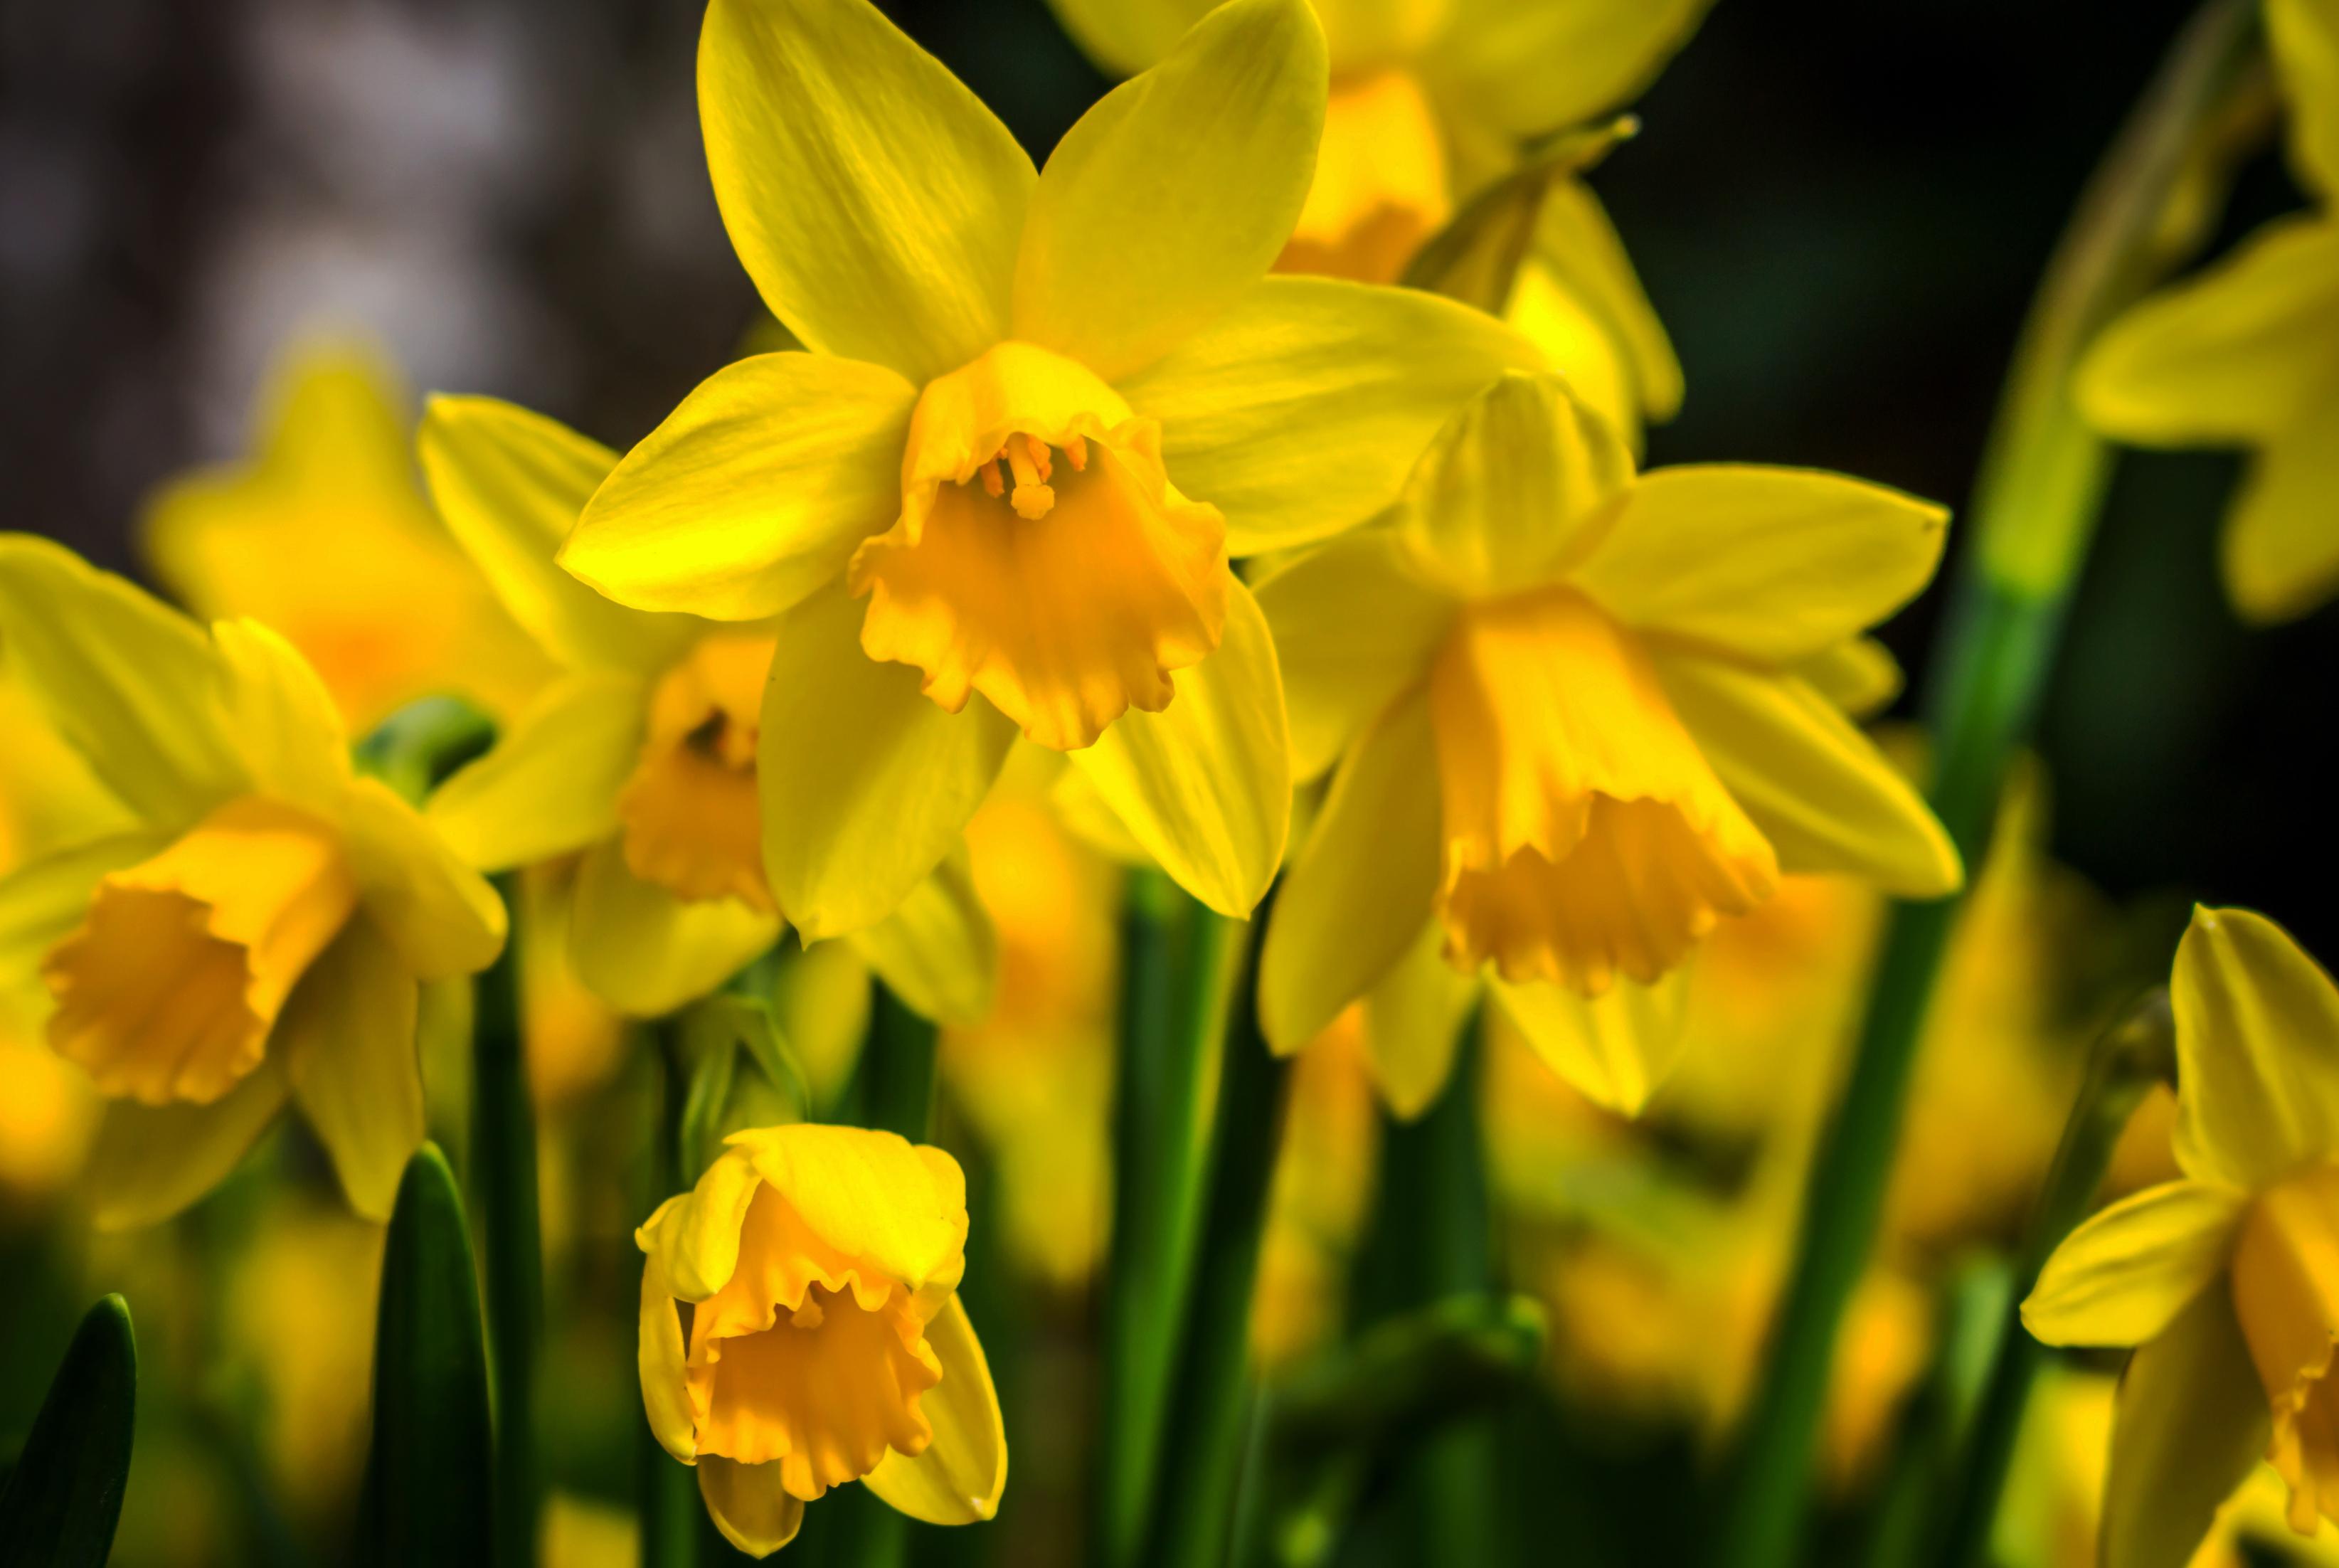 daffodils-photo-55